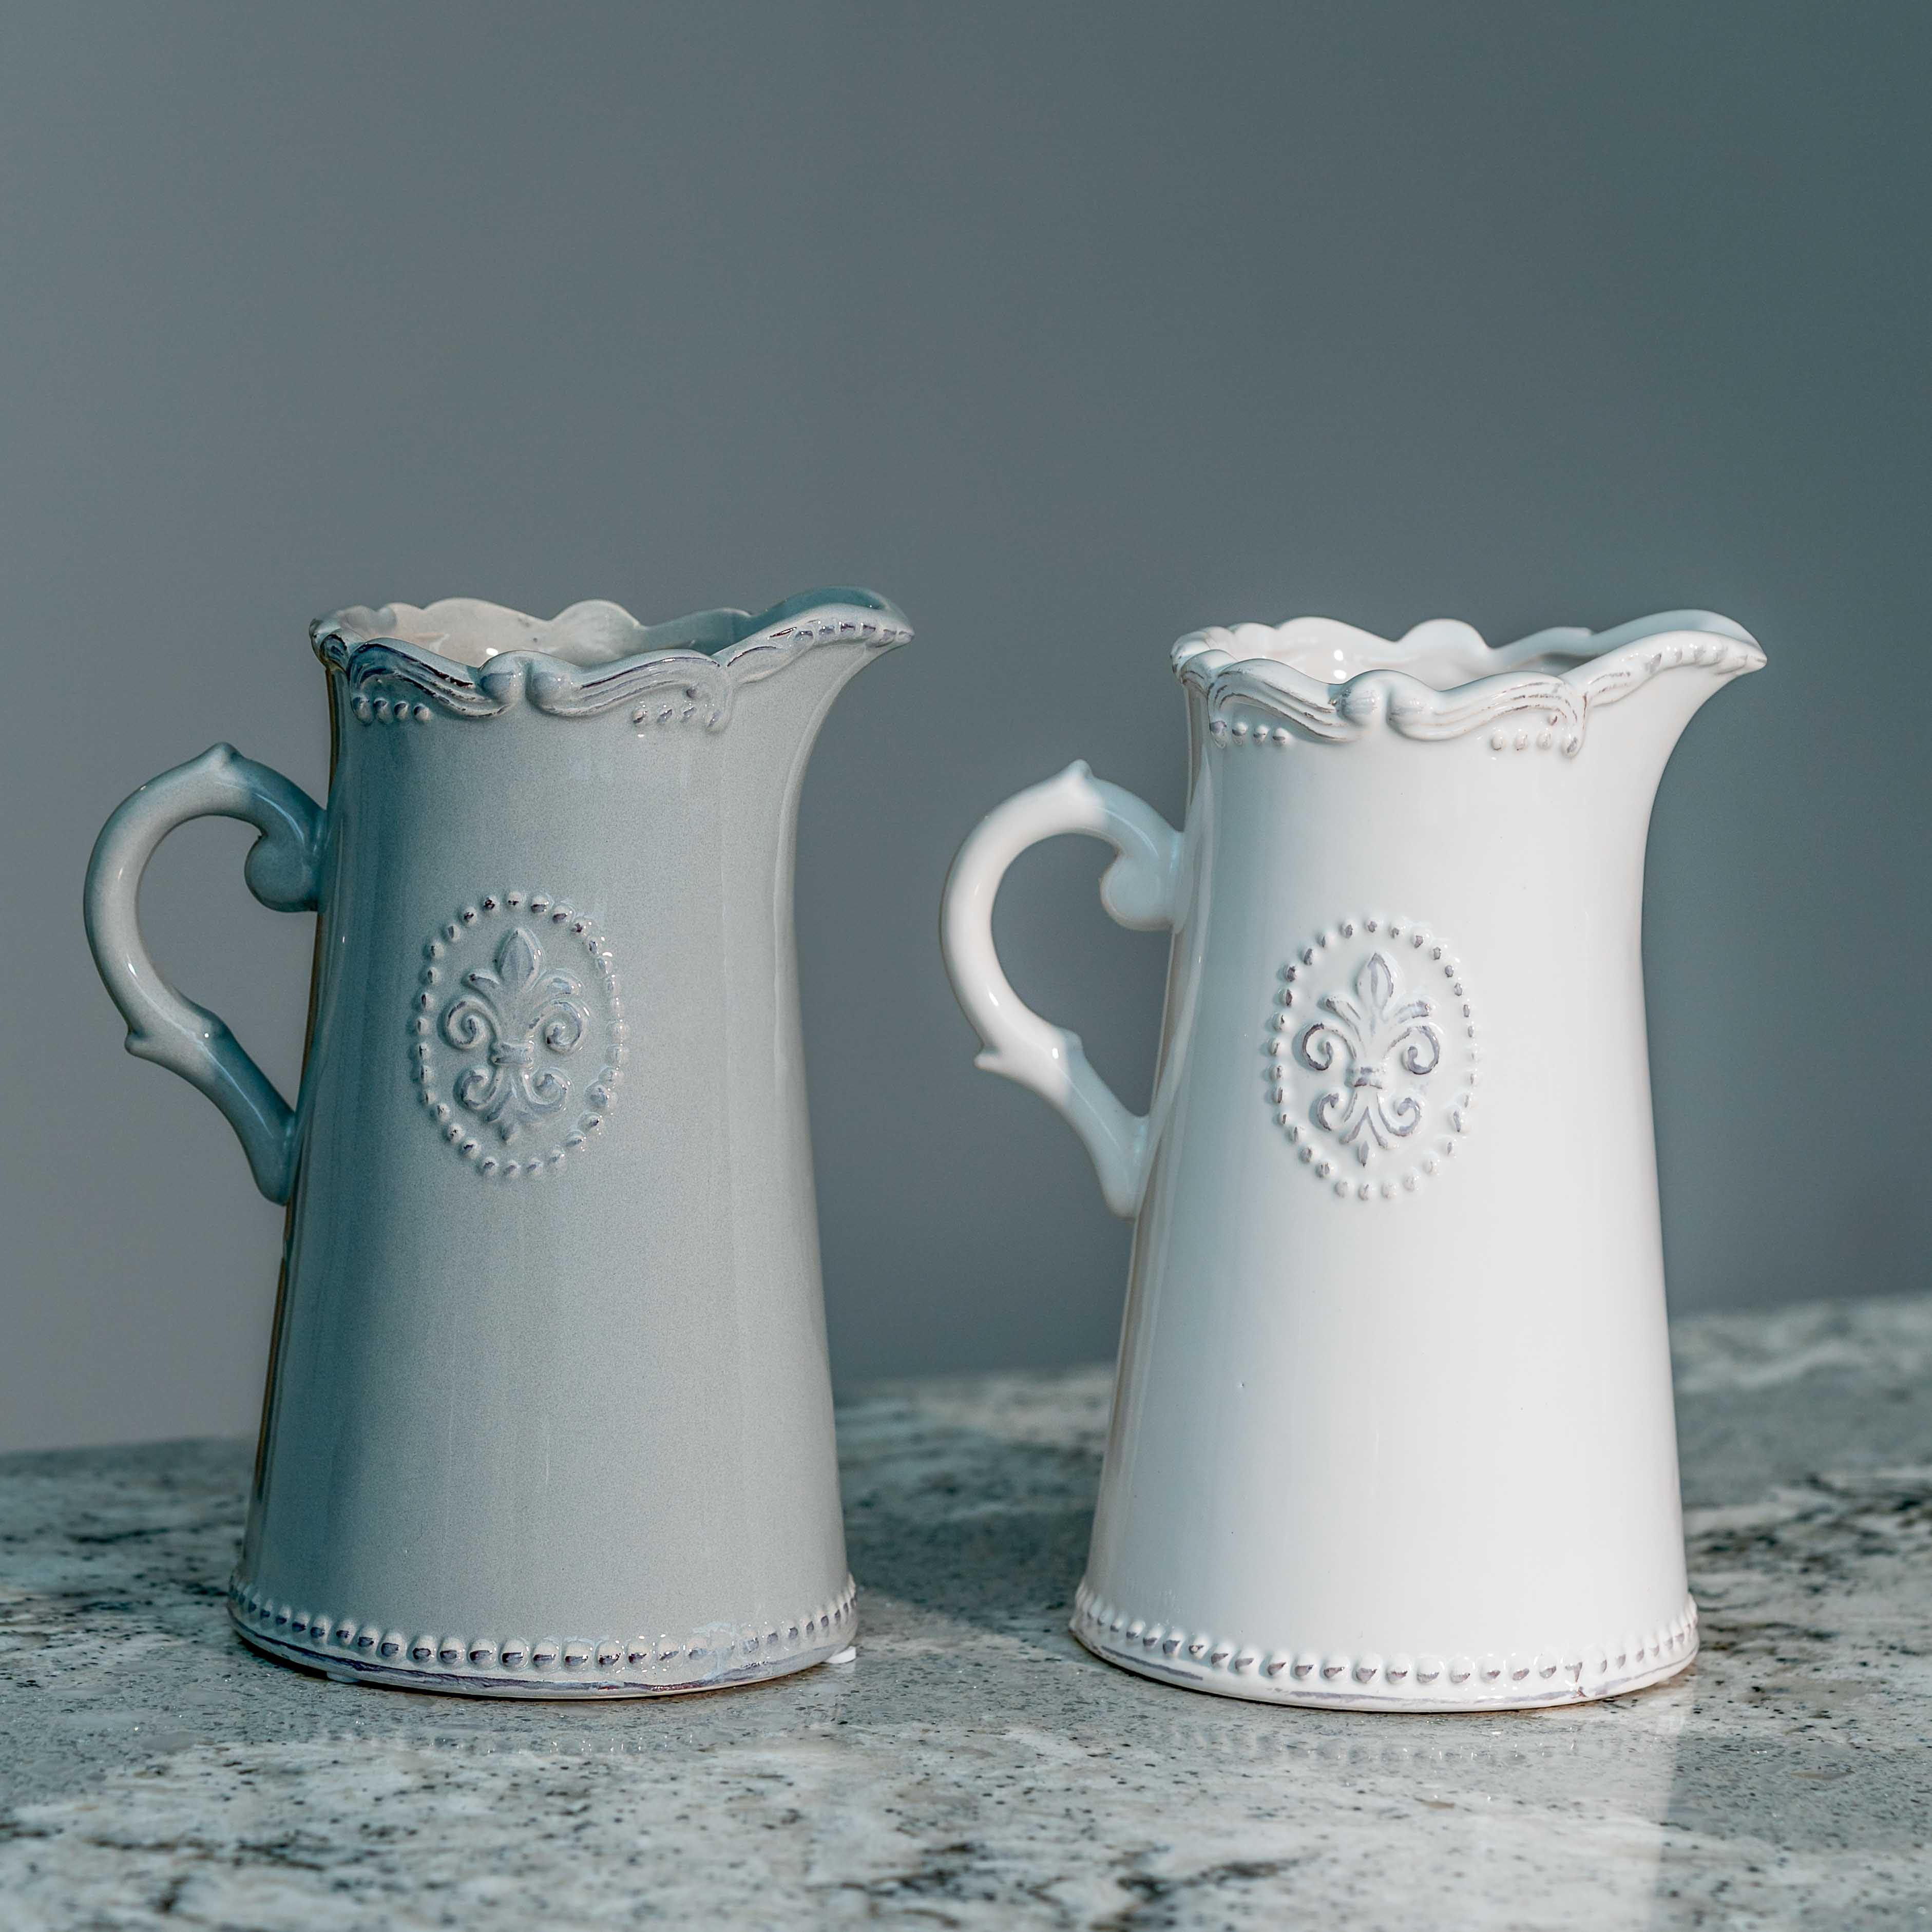 Fleur De Lis kande i keramik